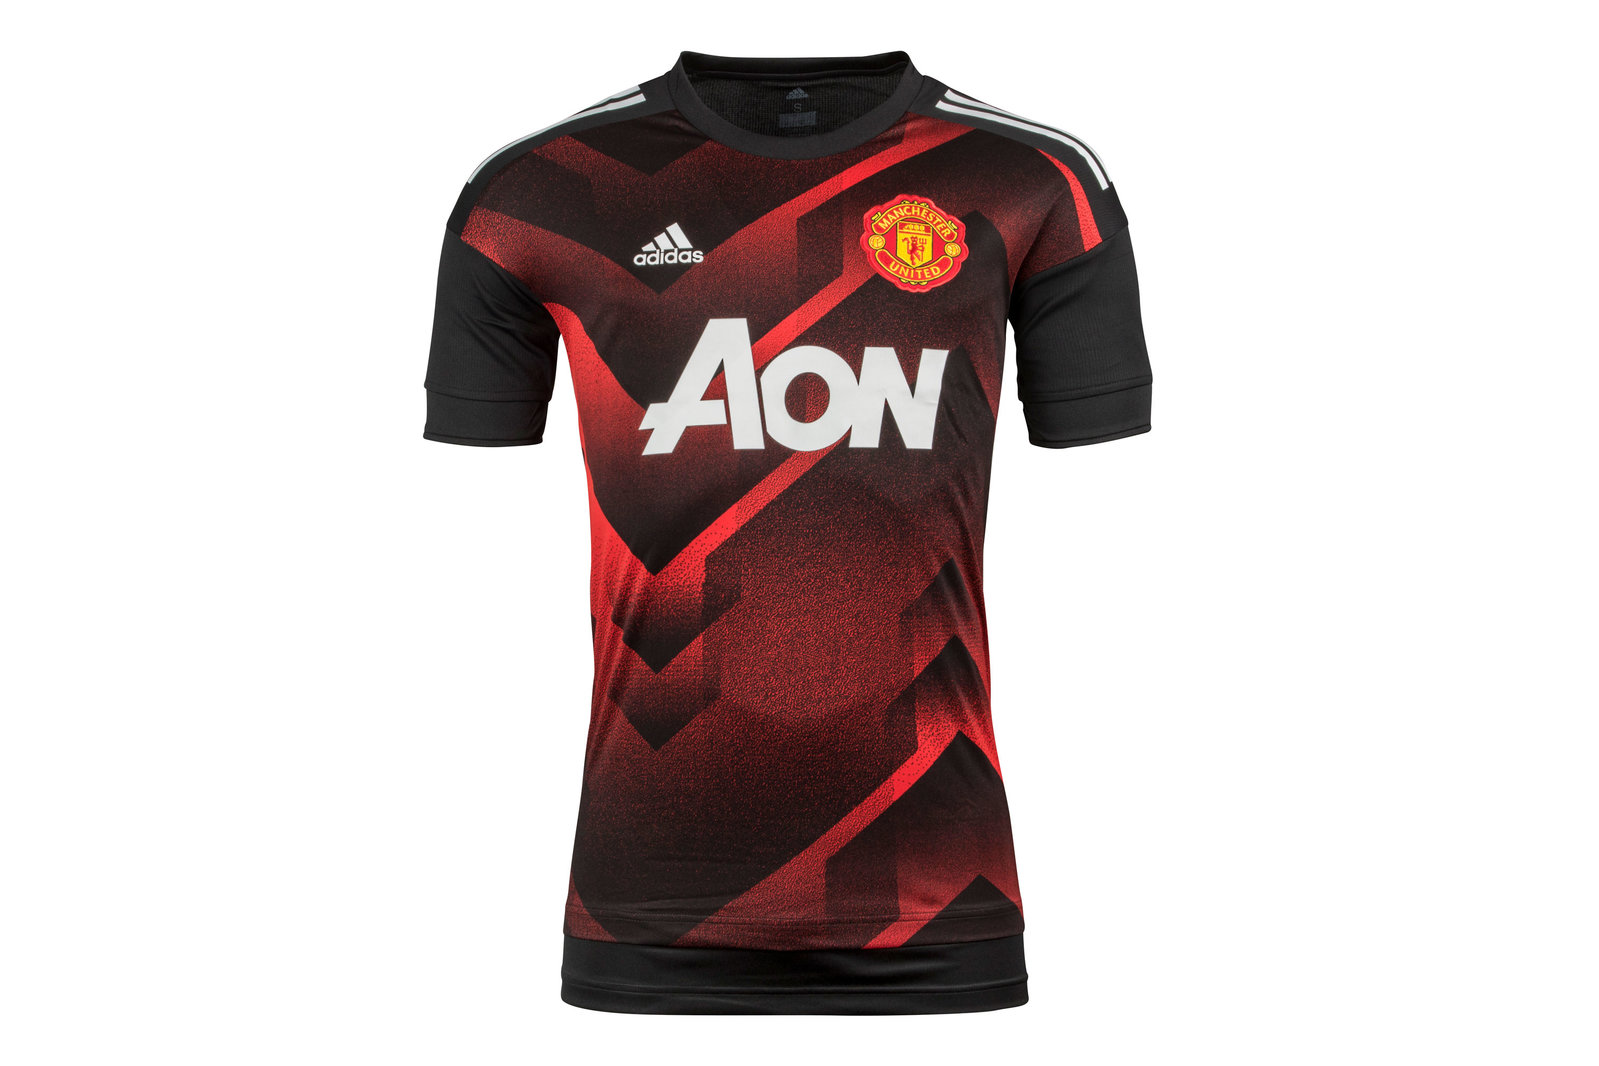 b09beb55252 adidas Mens Manchester United 17 18 Pre-Match Football Training Shirt